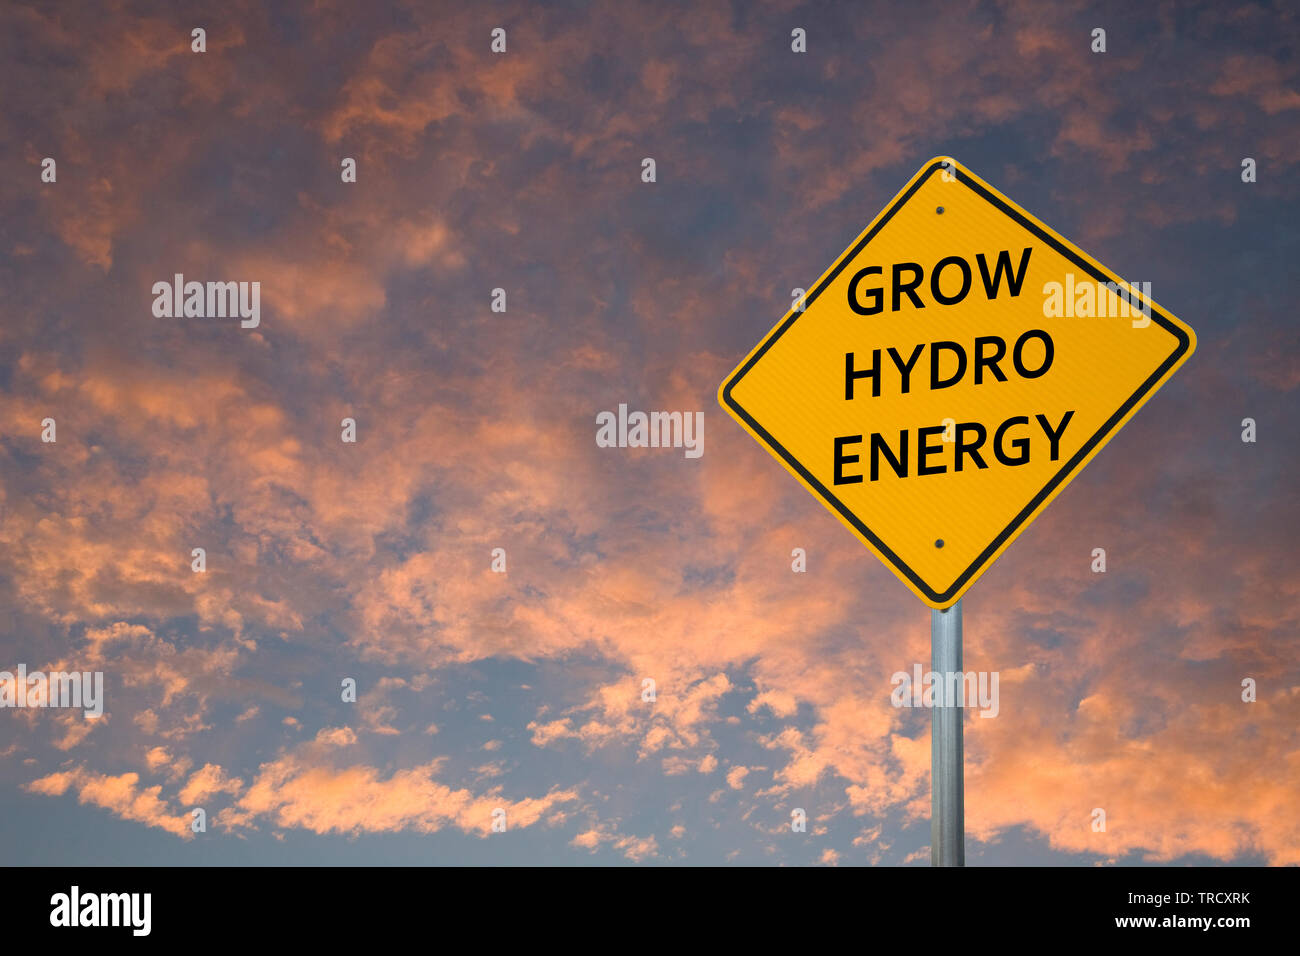 Grow Hydro Energy Stock Photo